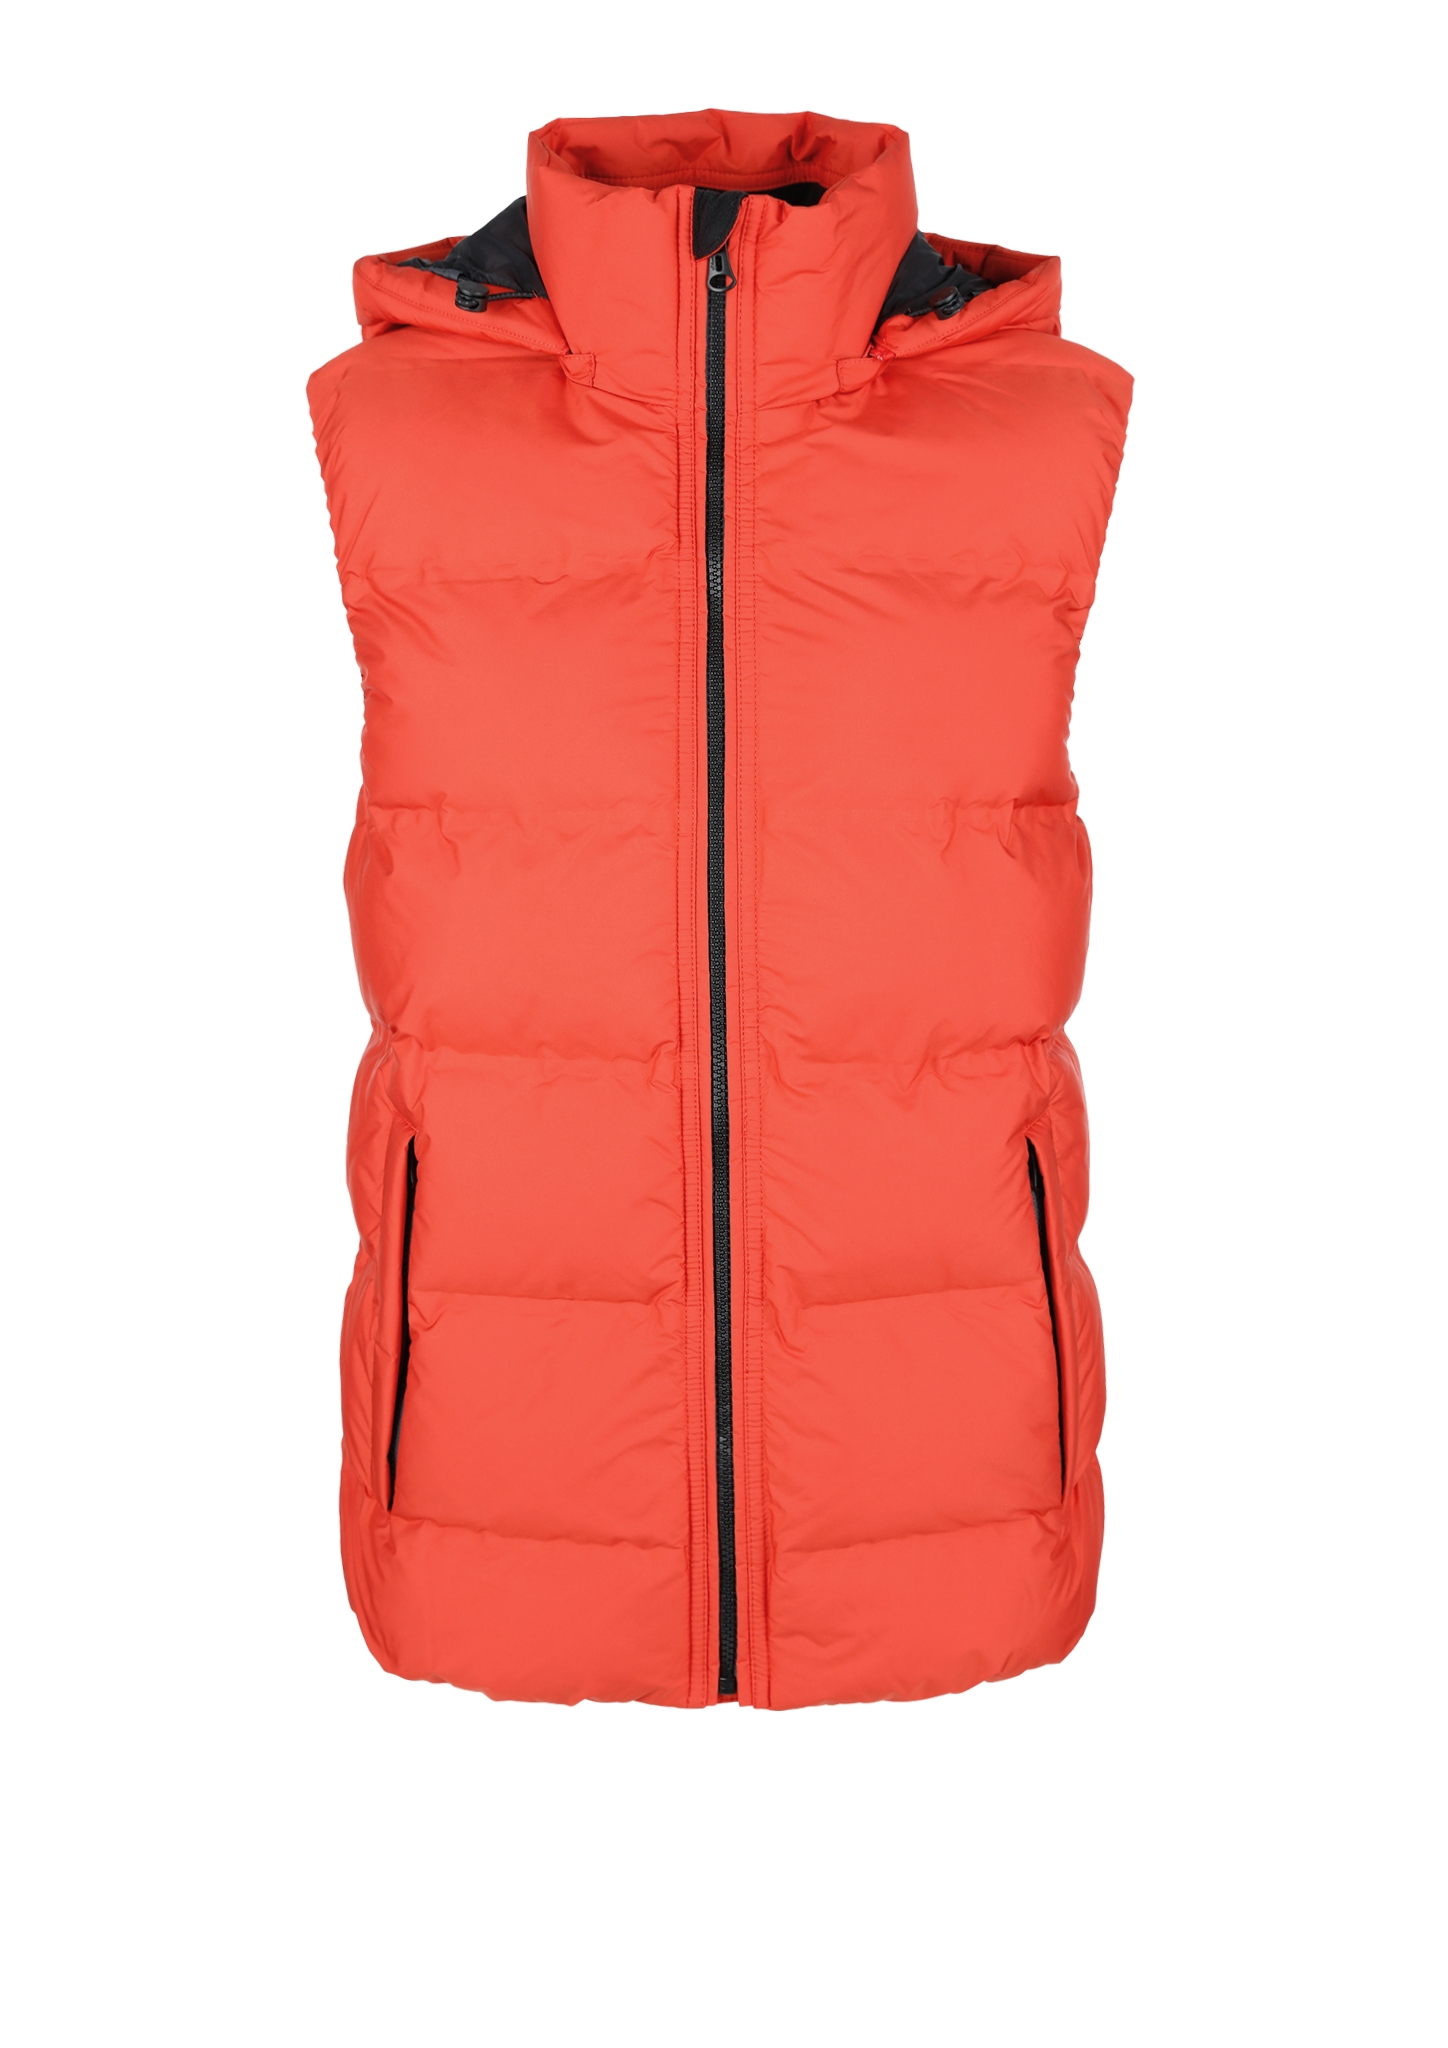 Steppweste | Bekleidung > Westen > Steppwesten | Rot | Obermaterial 100% polyester| futter 100% polyamid| füllmaterial 100% polyester | s.Oliver